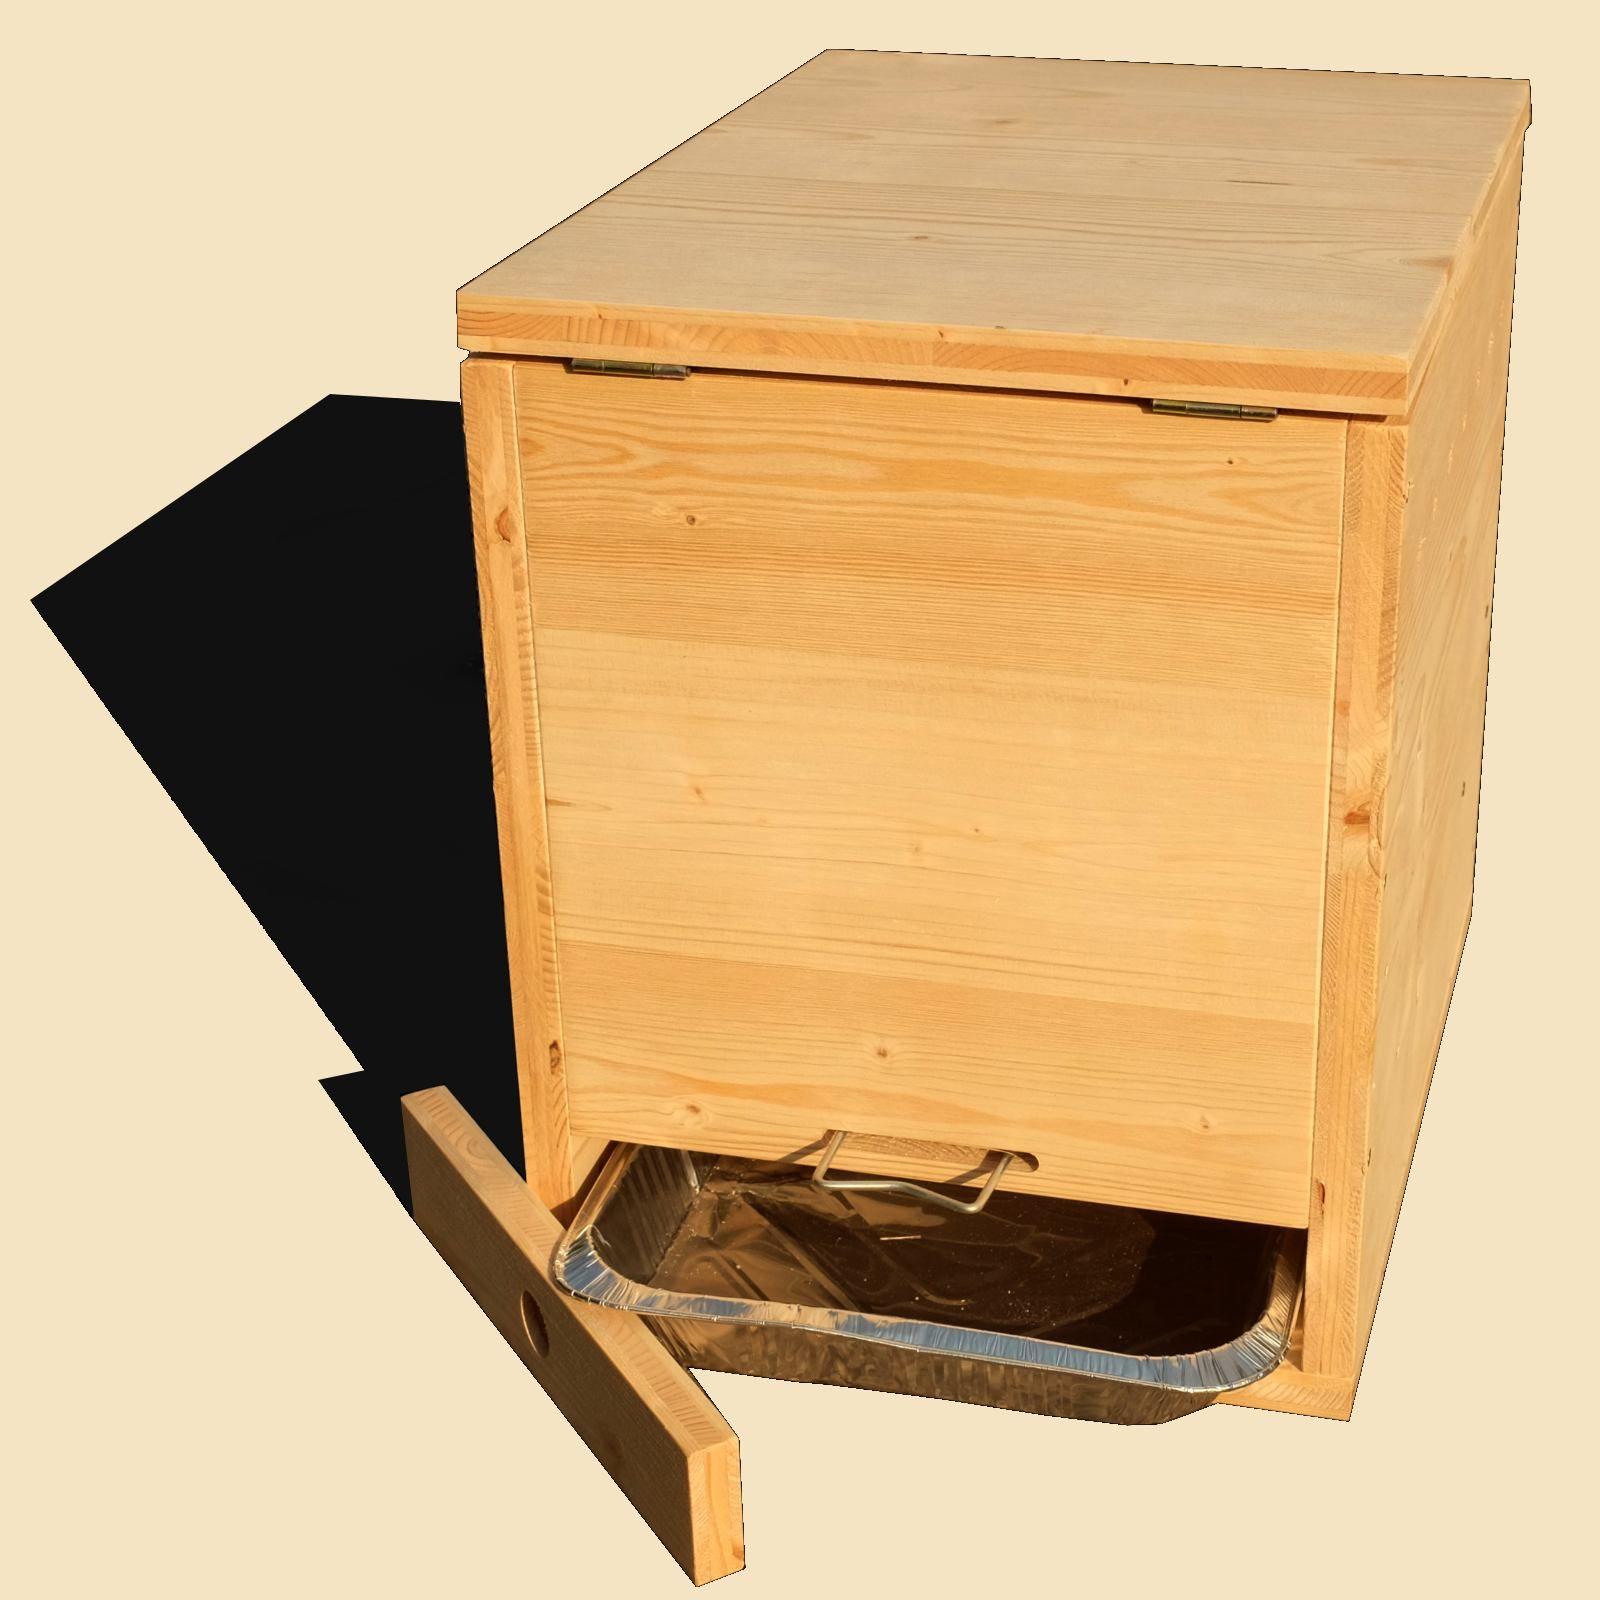 wurmkomposter selber bauen bio ko fair umwelt wurmkompost kompost und wurmfarm. Black Bedroom Furniture Sets. Home Design Ideas